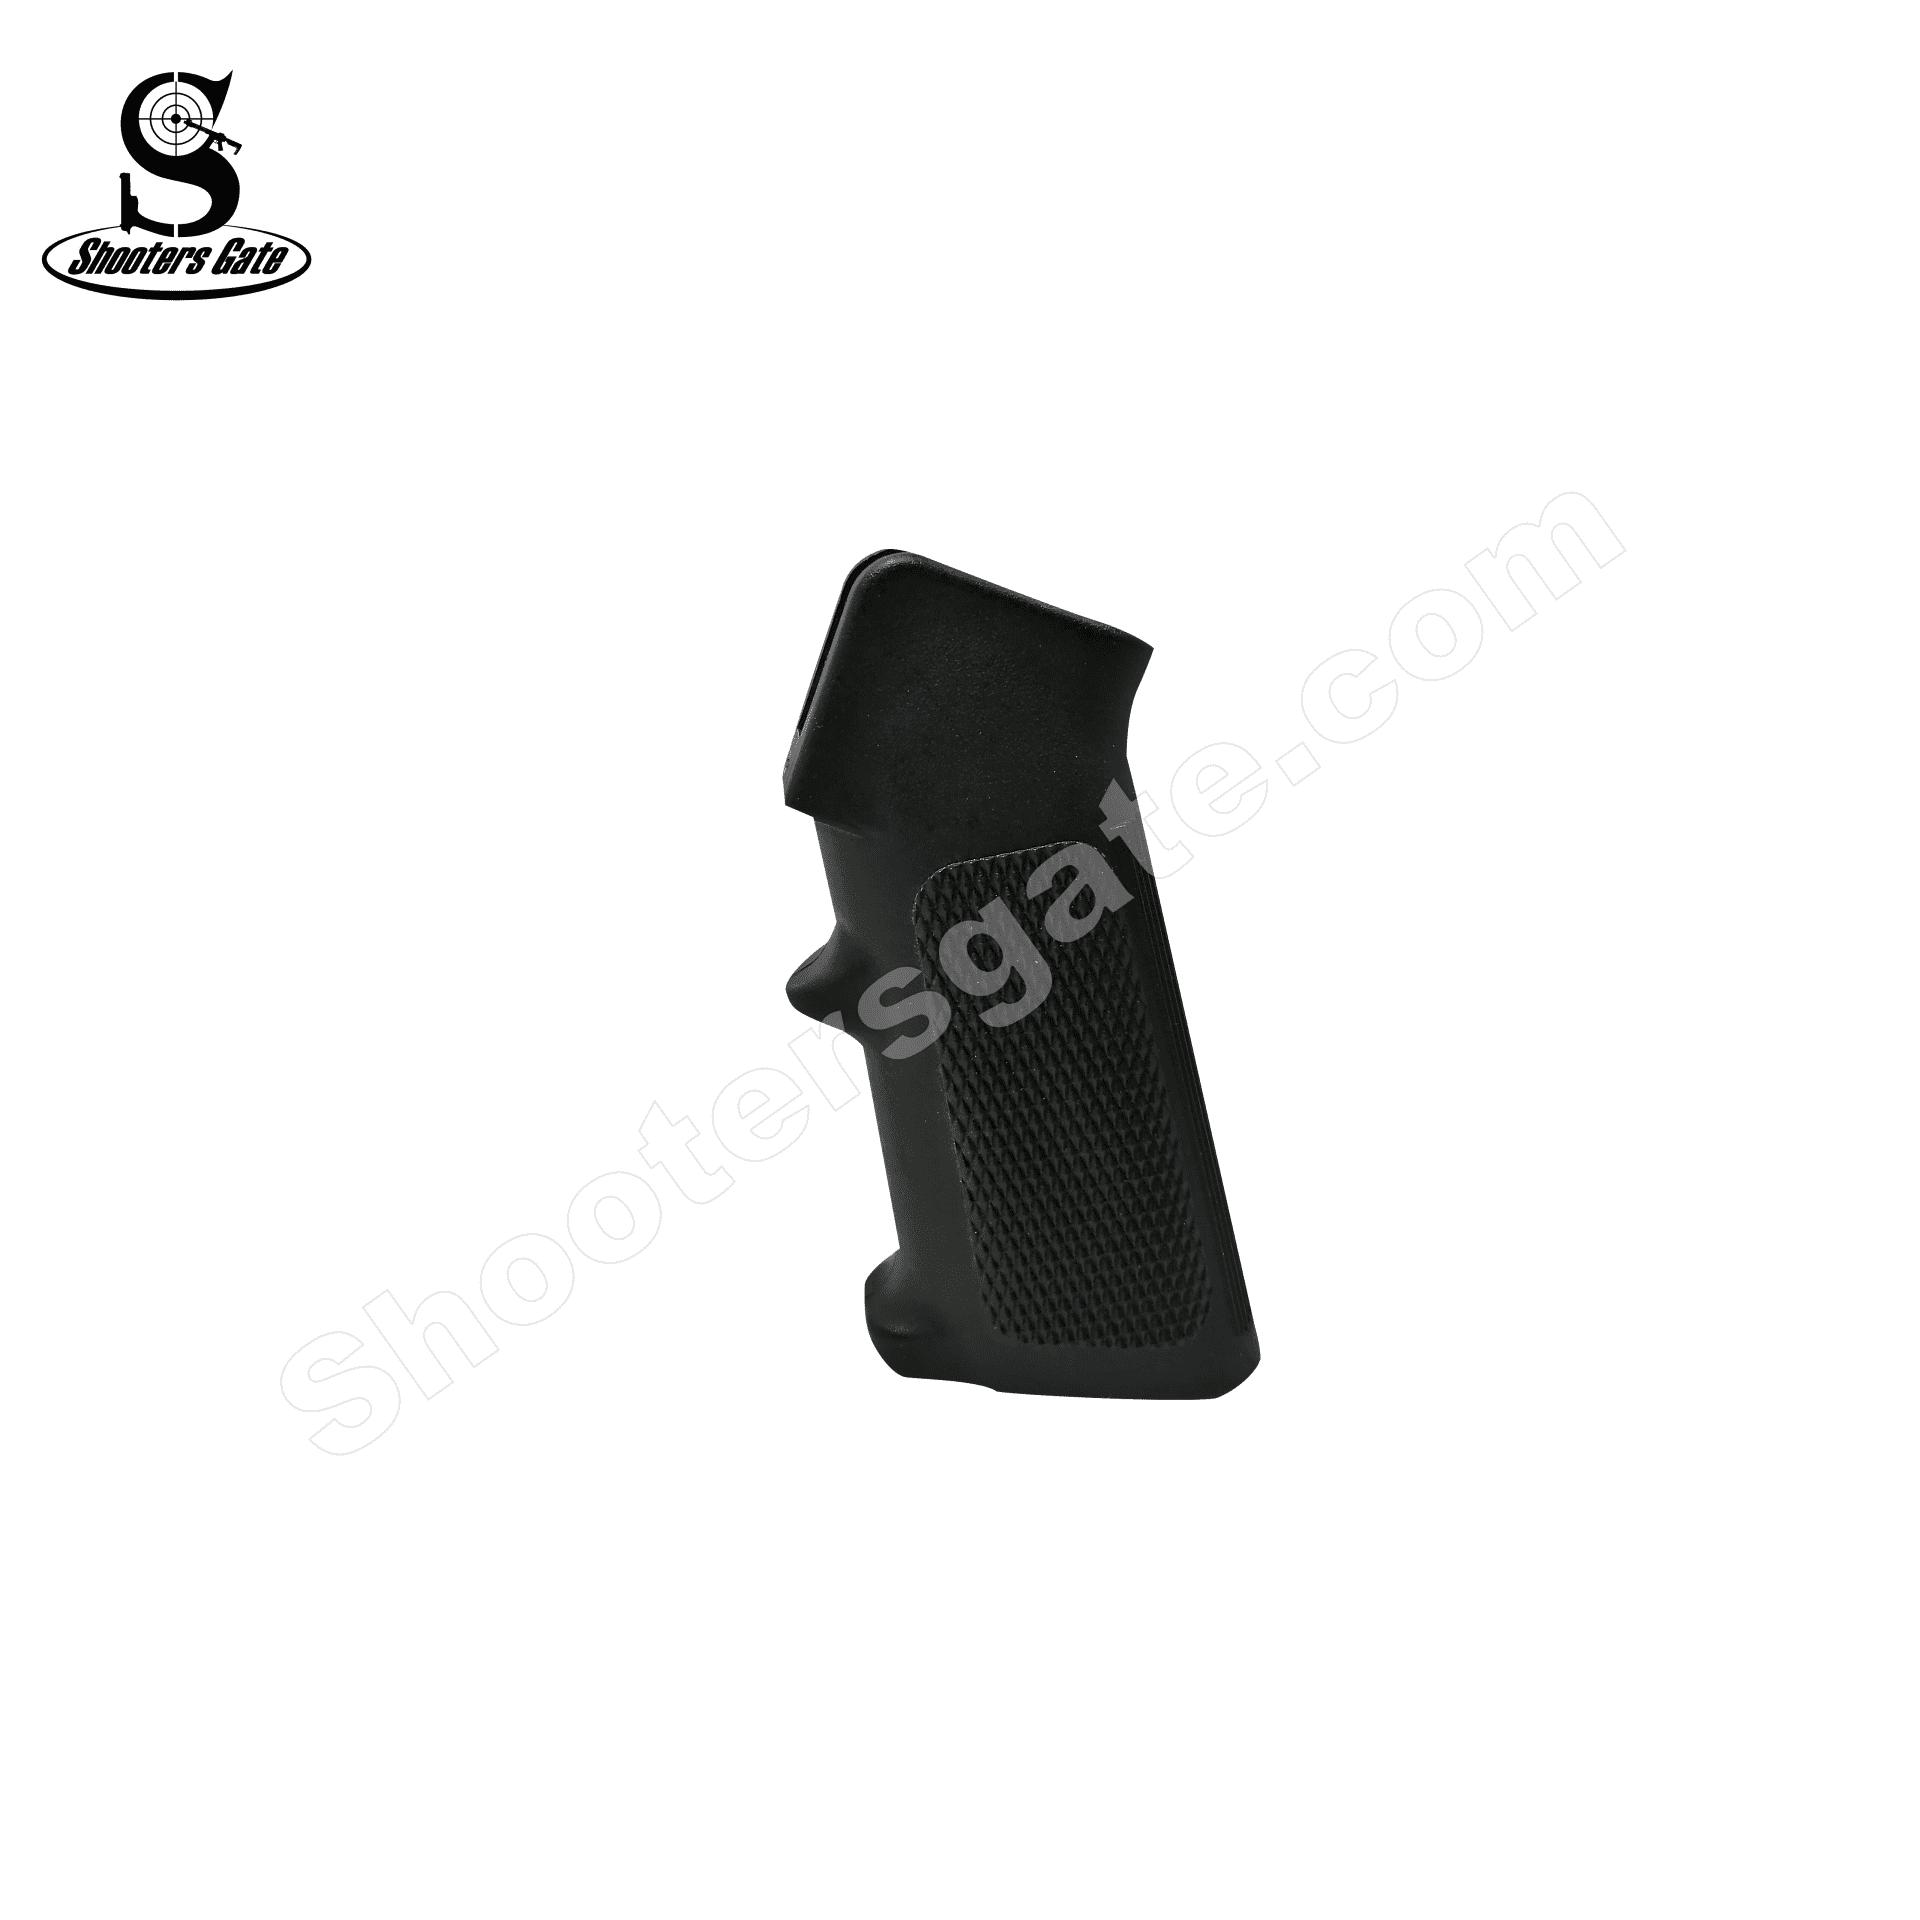 Standard Pistol Grip